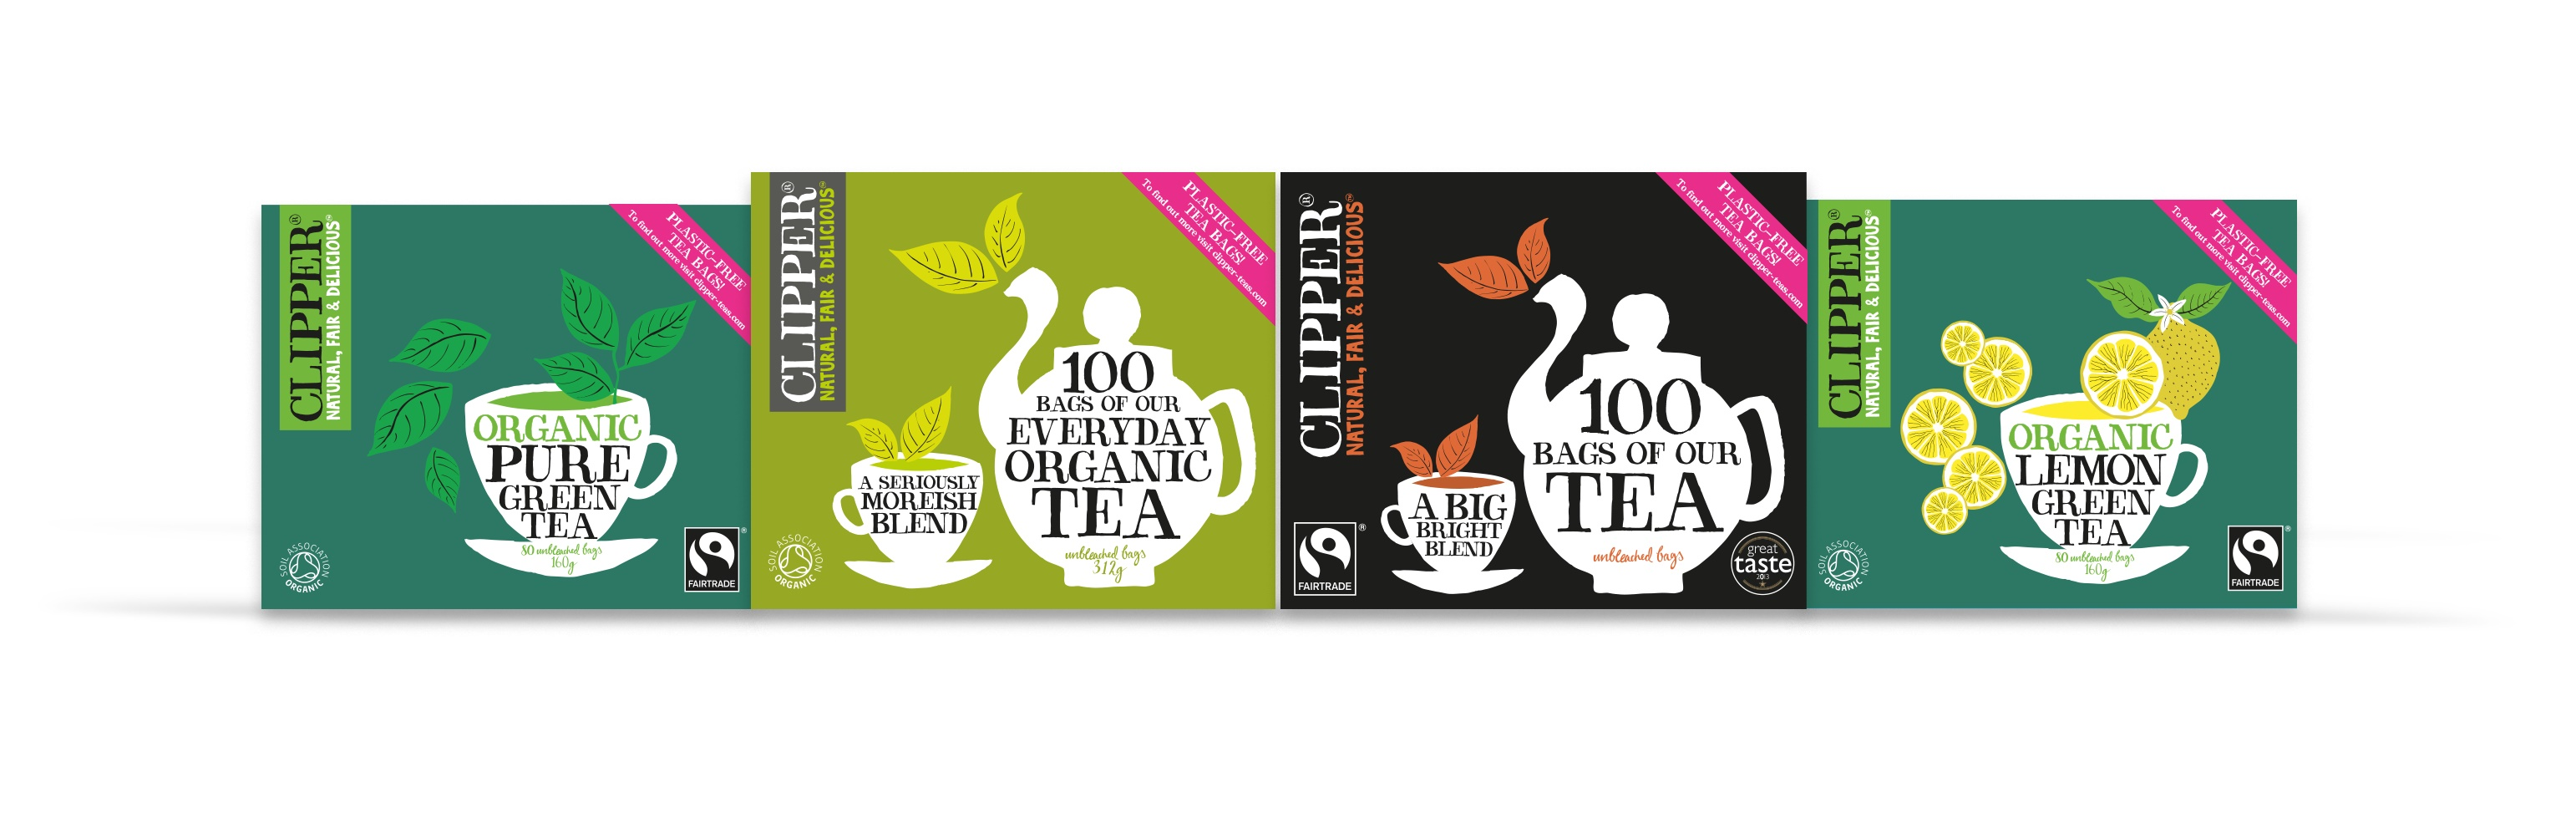 Plastic free tea bags box design - mock up.jpg